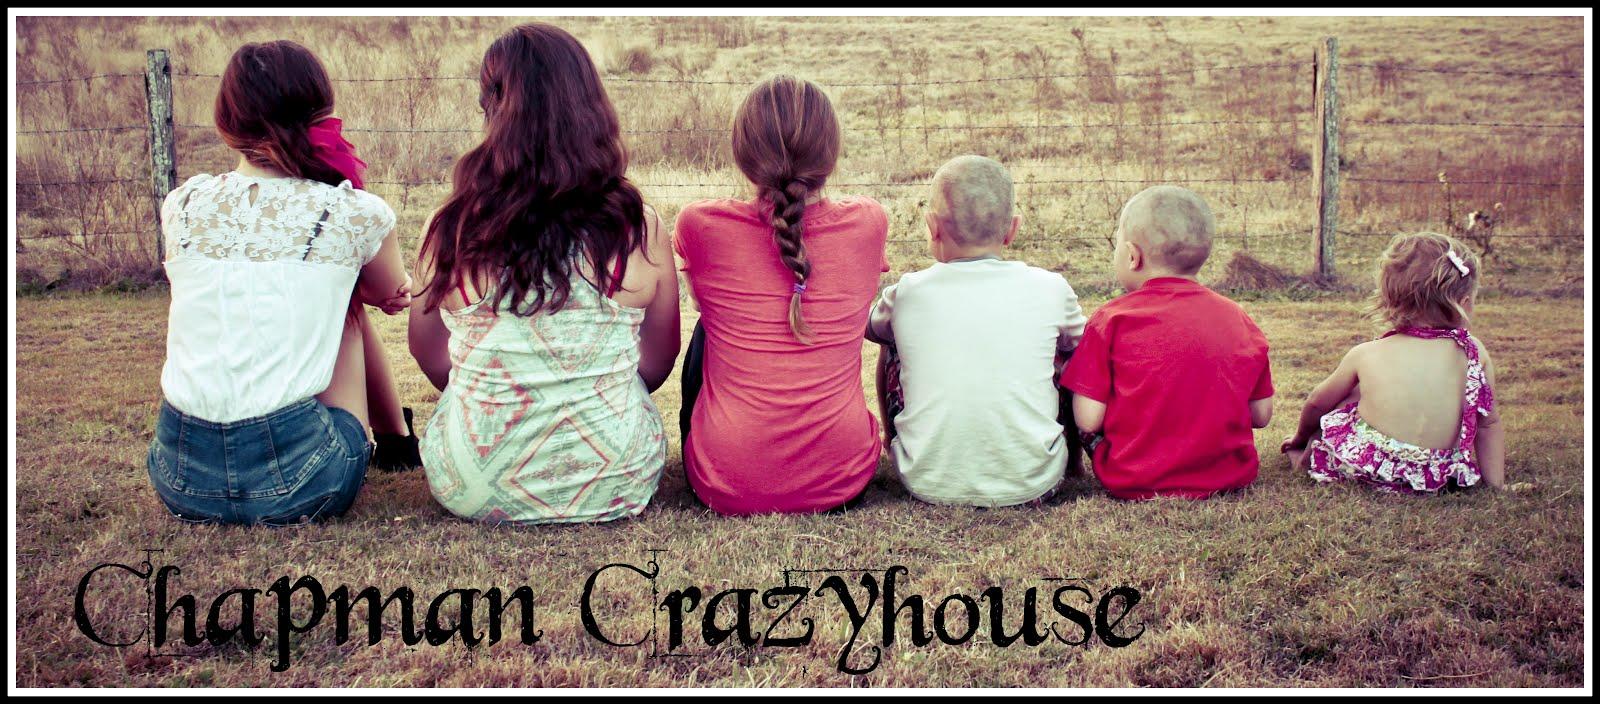 Chapman Crazyhouse